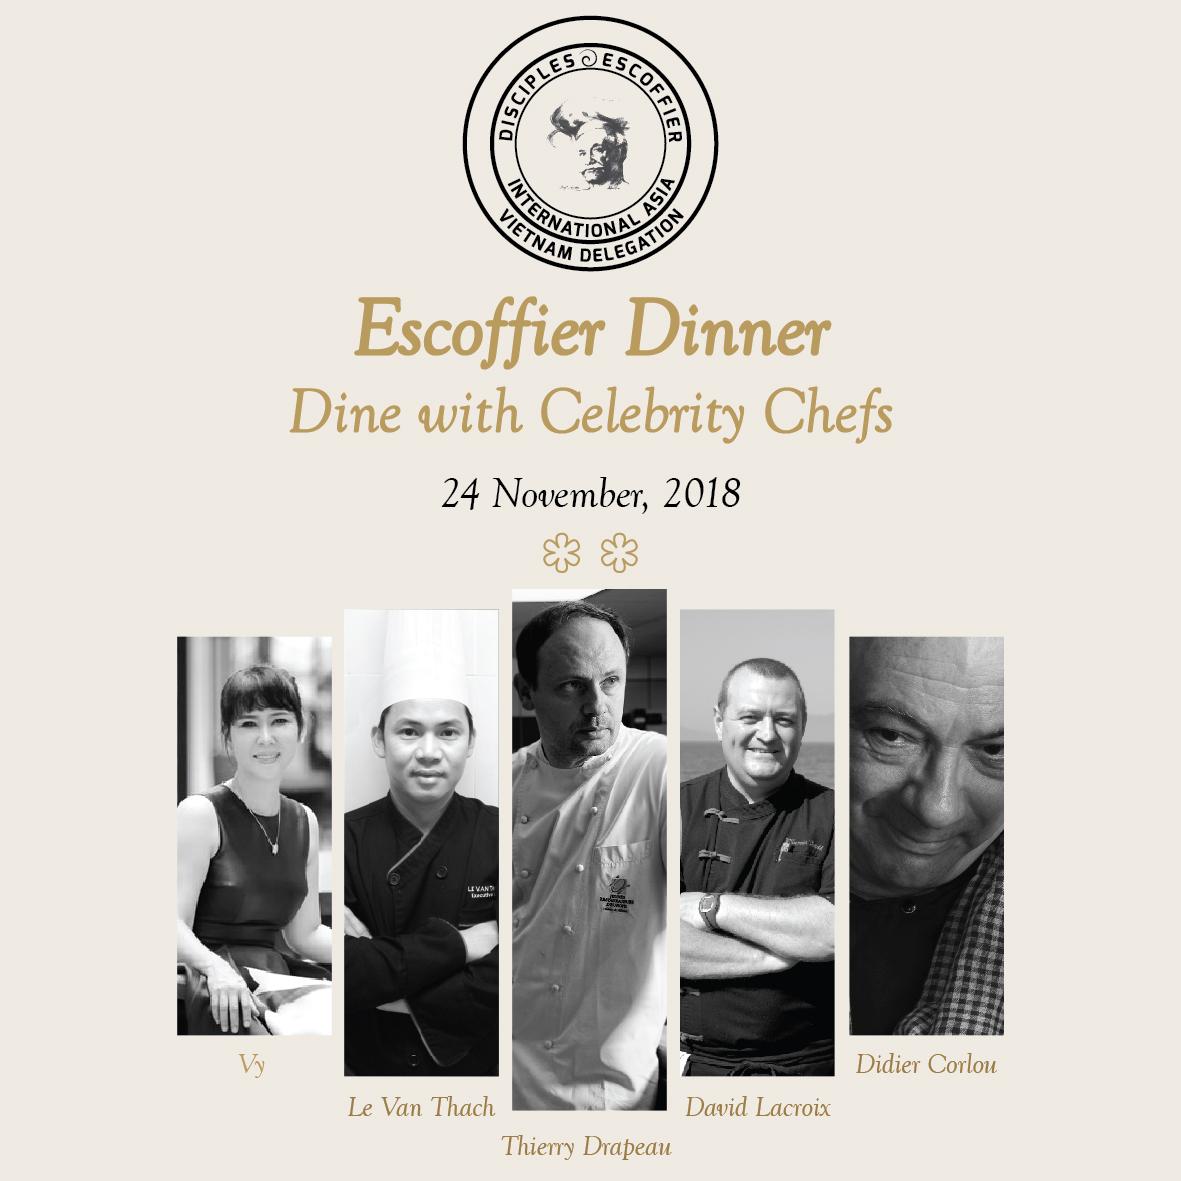 Hotel Royal Hoi An giới thiệu sự kiện bữa tối Escoffier 3